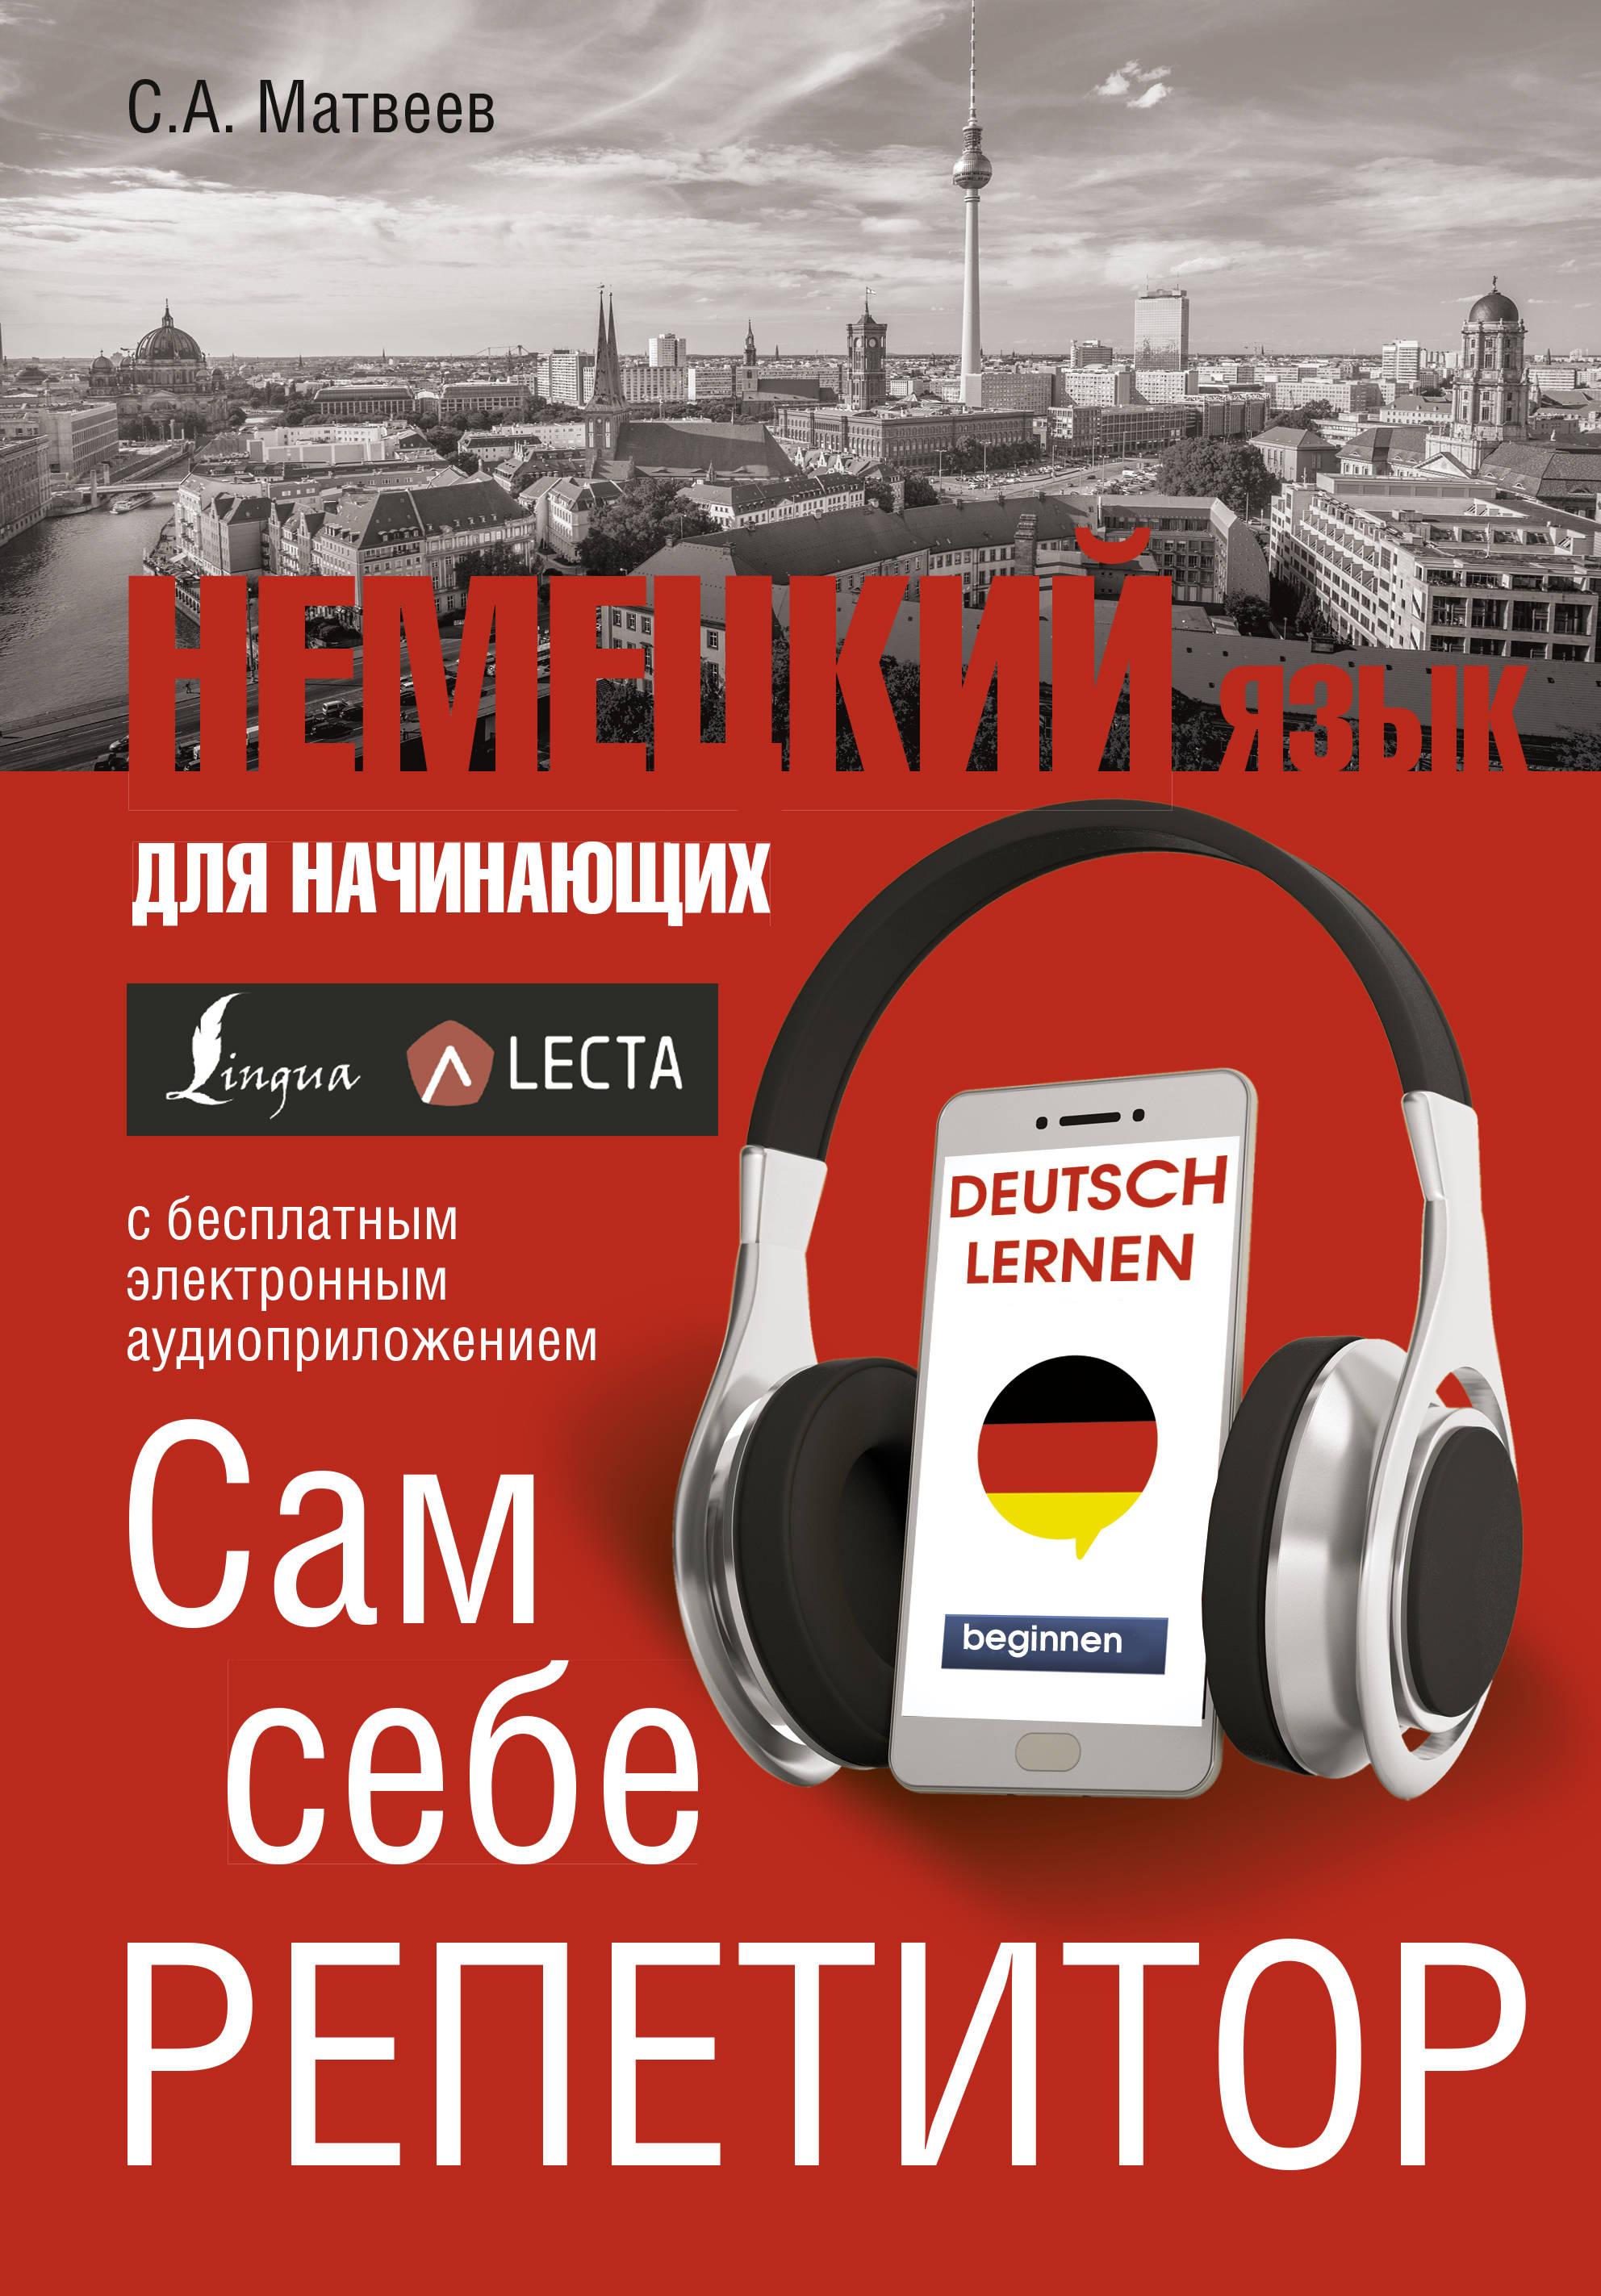 Nemetskij jazyk dlja nachinajuschikh. Sam sebe repetitor + LECTA